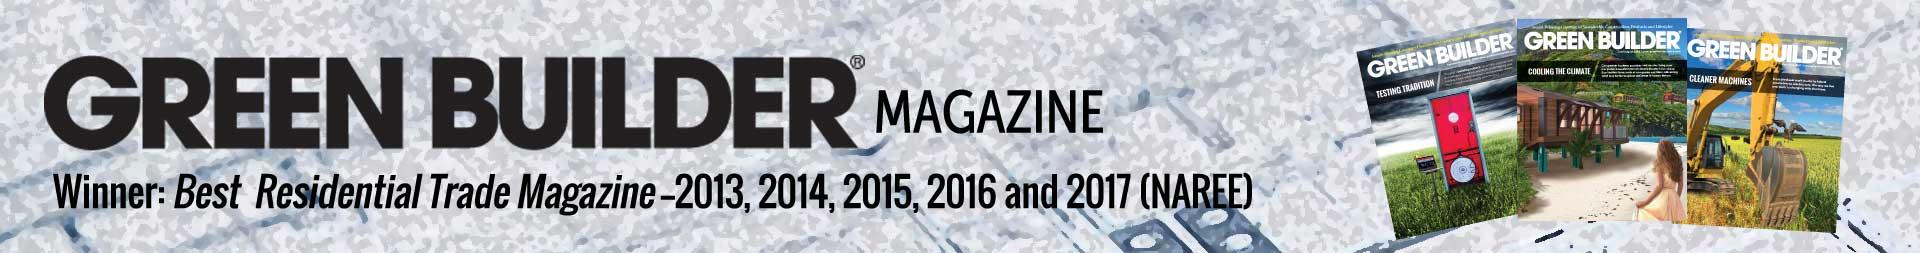 GB-Magazine-Banner-1.jpg